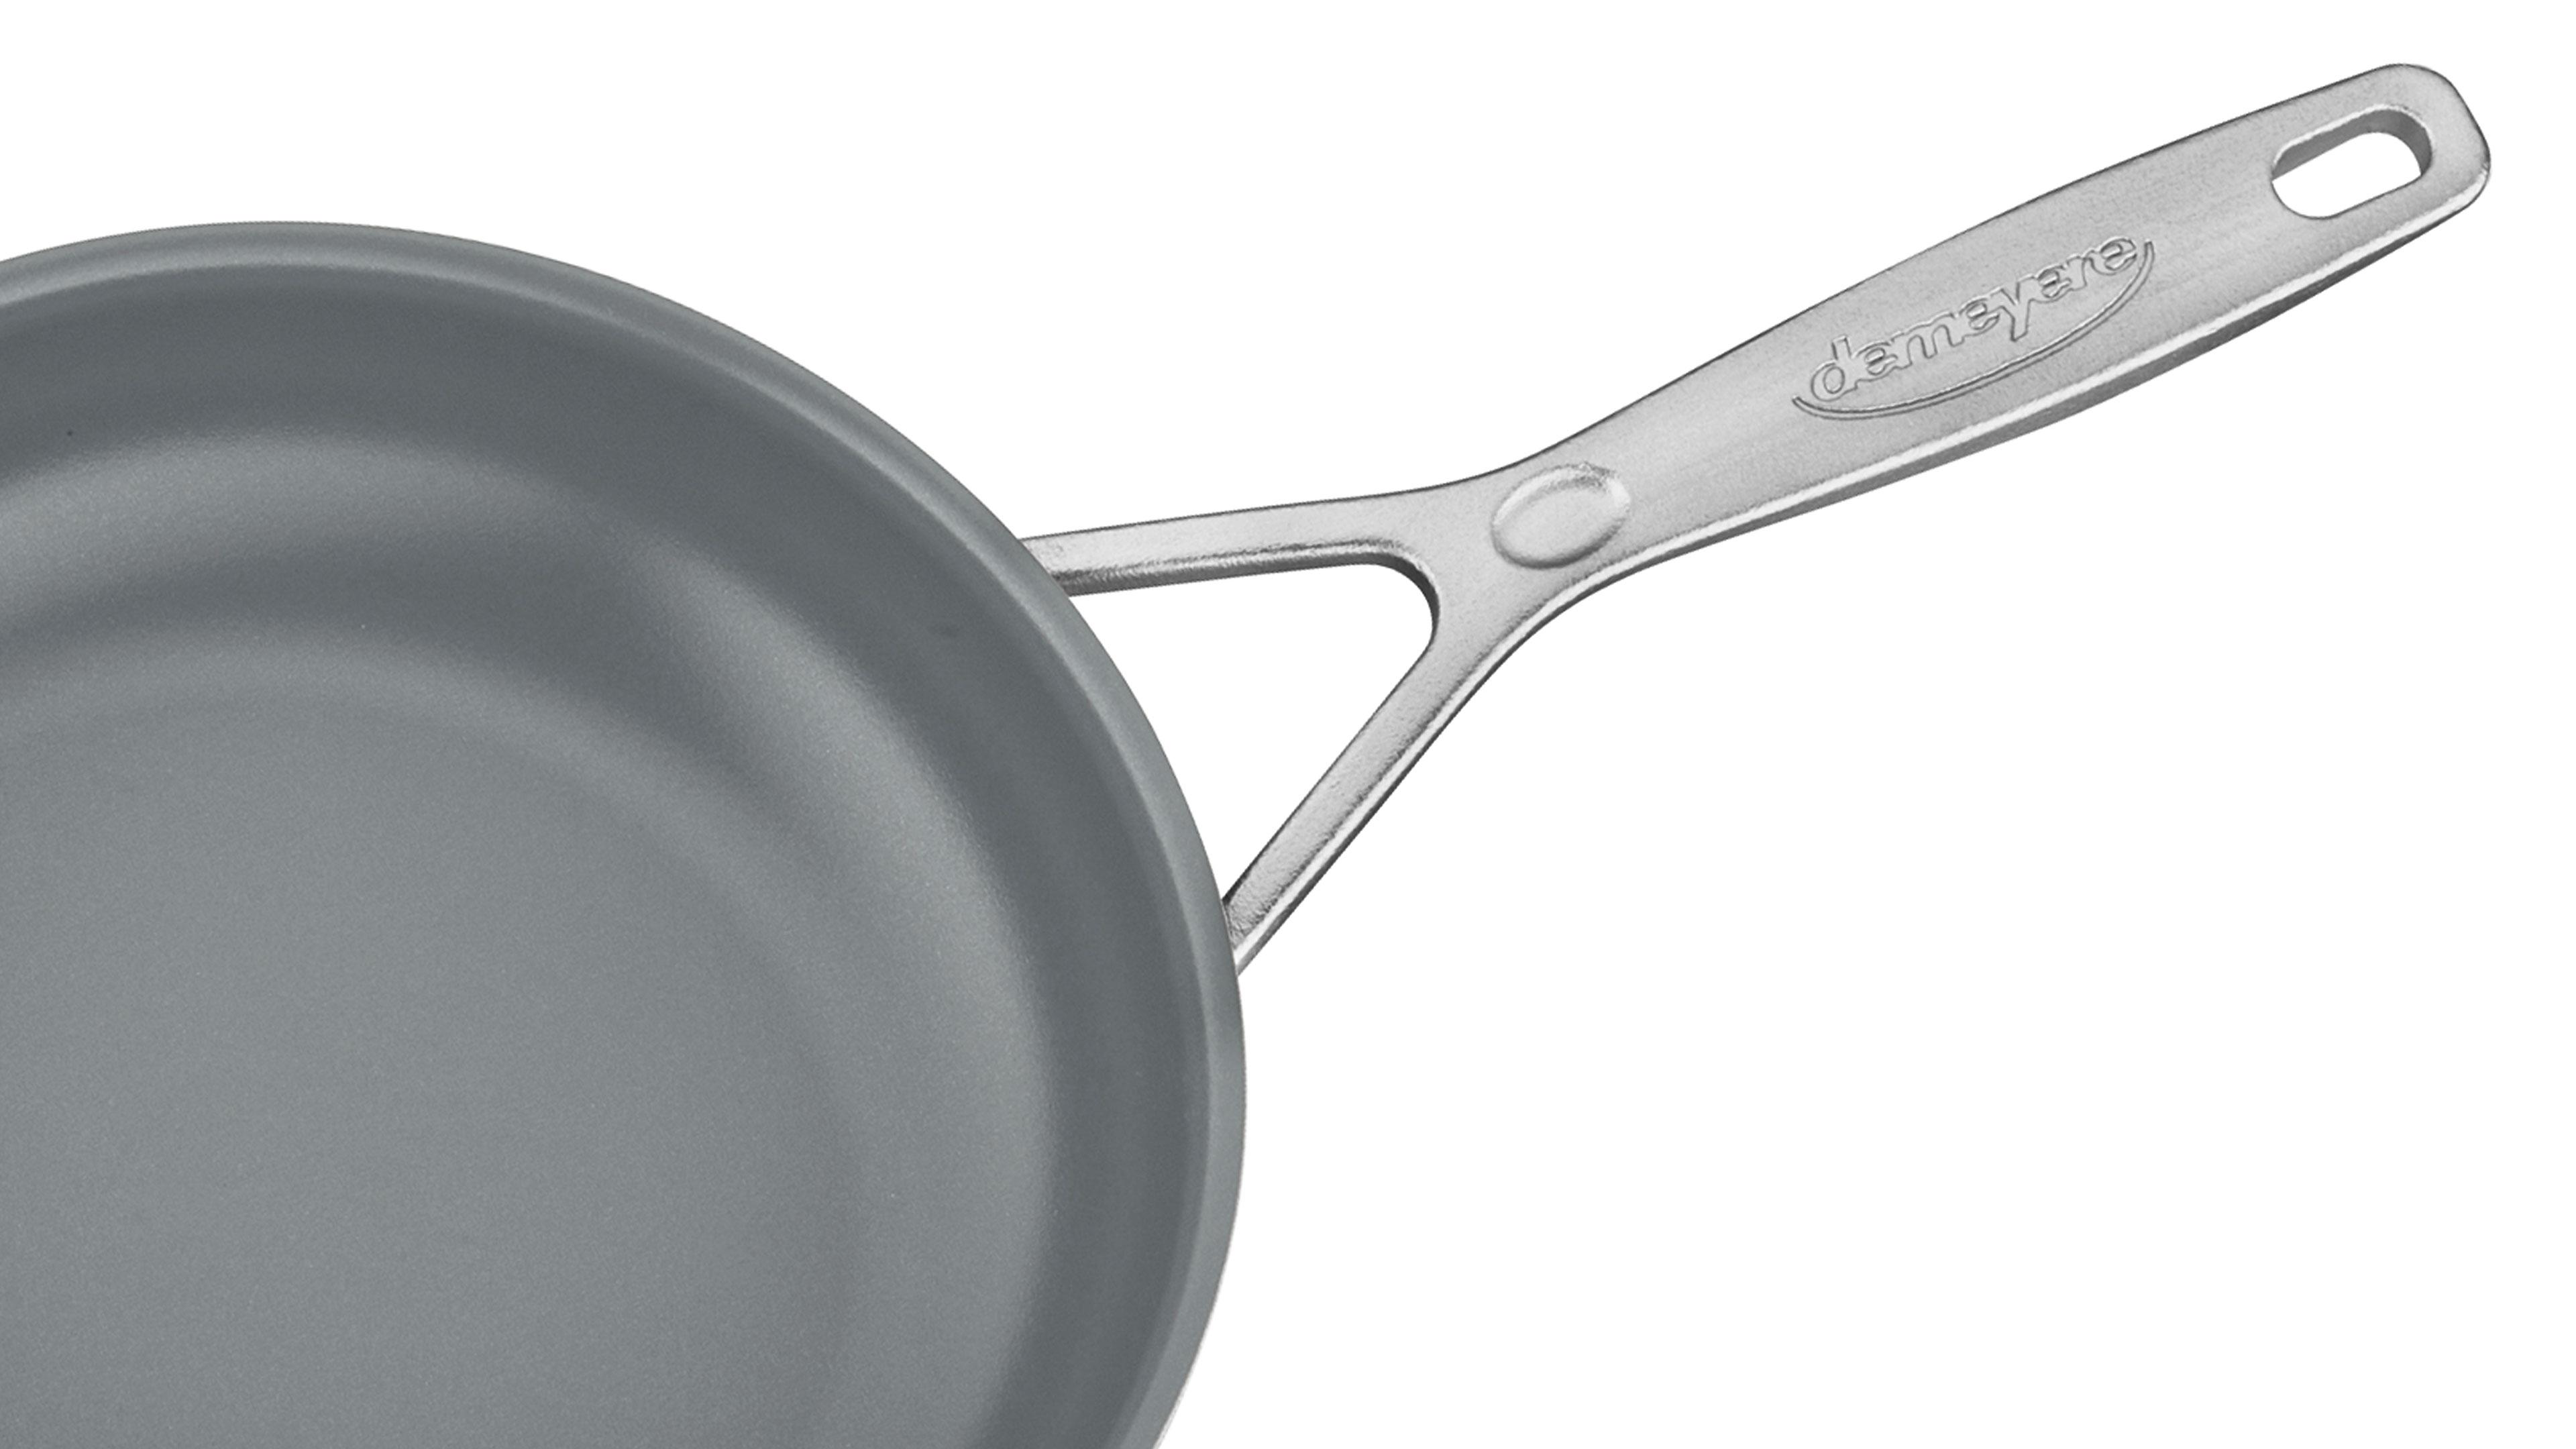 Demeyere Industry5 Ceramic Nonstick Stainless Steel